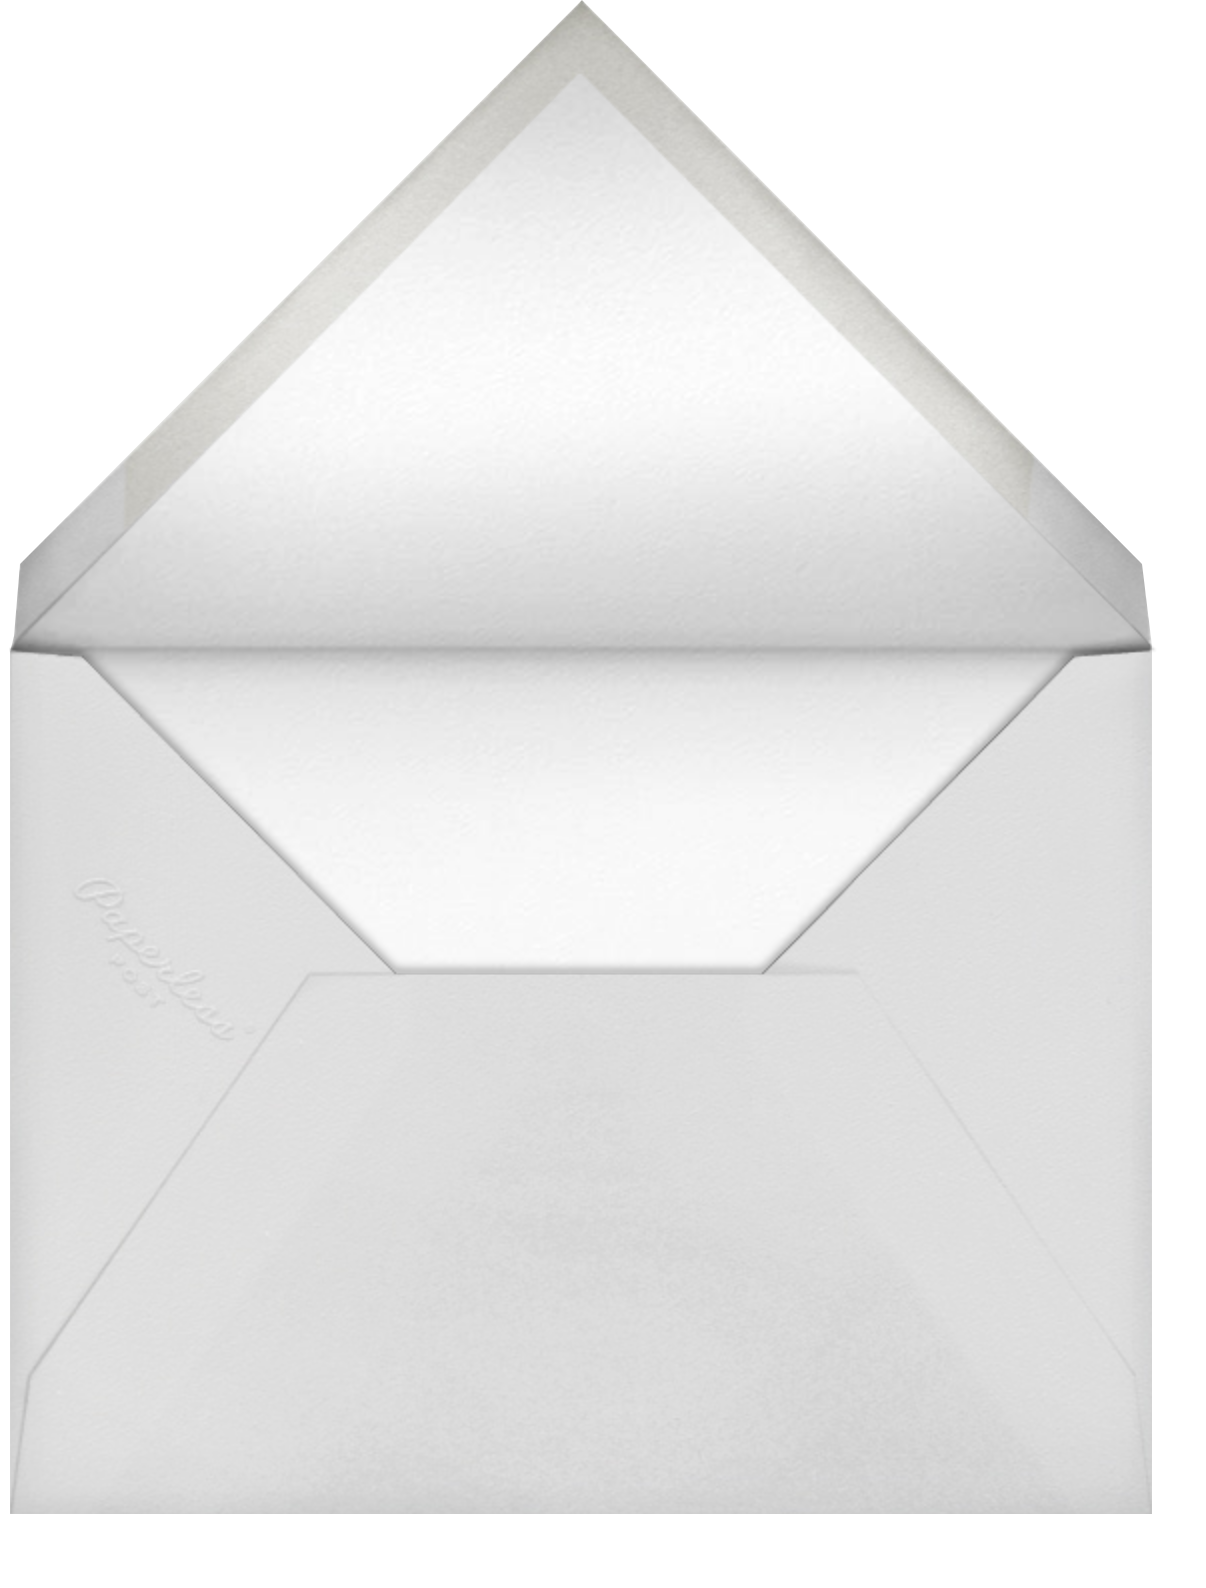 Stella and Dot - Tiger - Paperless Post - Envelope